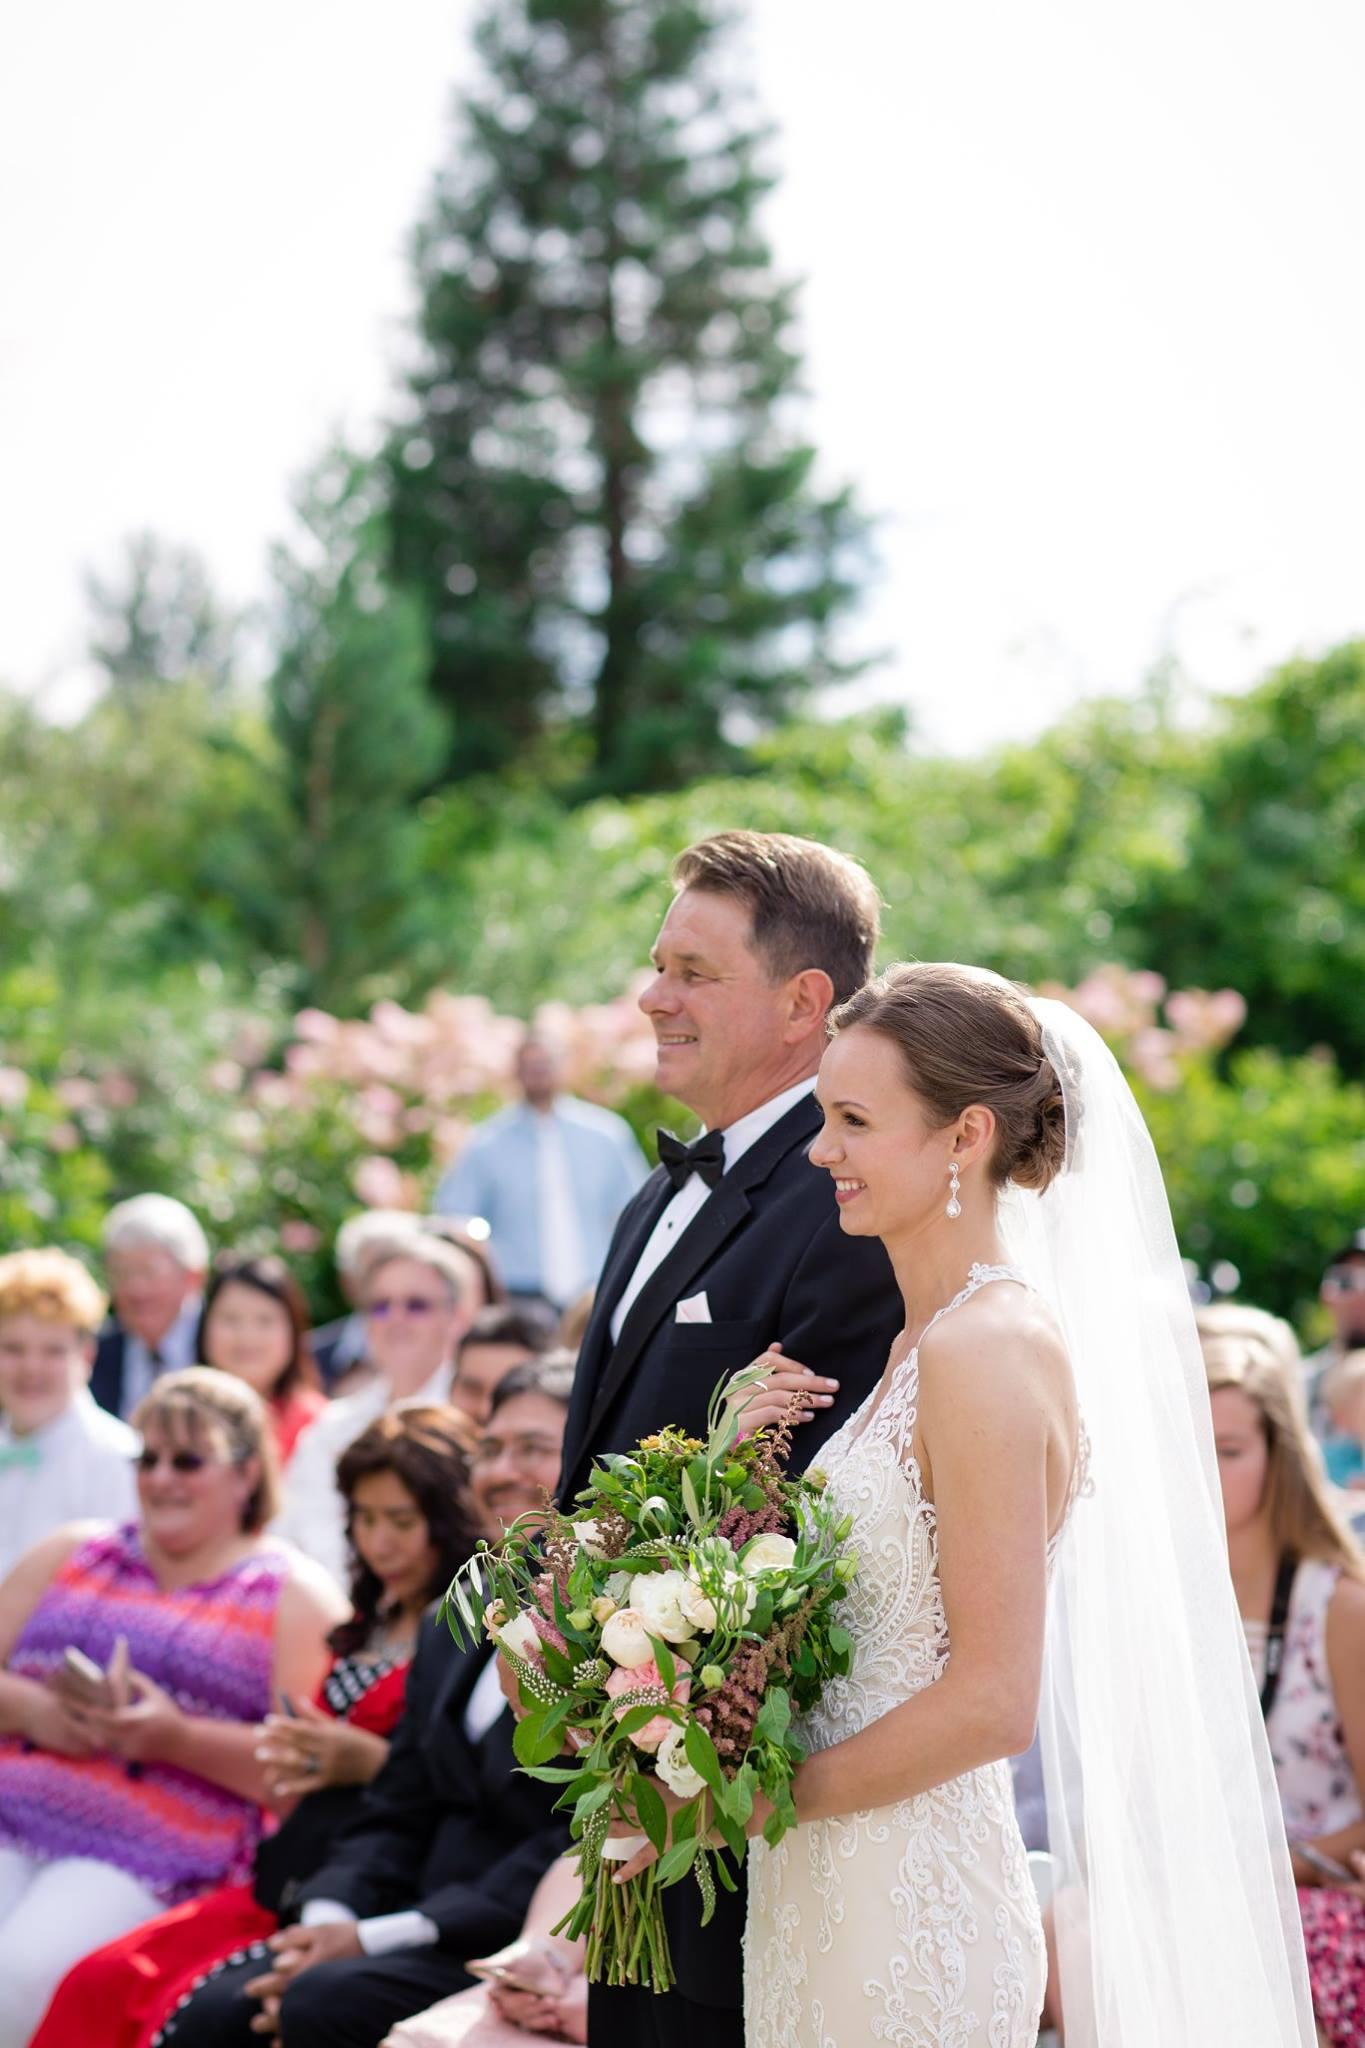 Edgefield_Wedding_Portland_Bride_griffineventmanagement.jpg